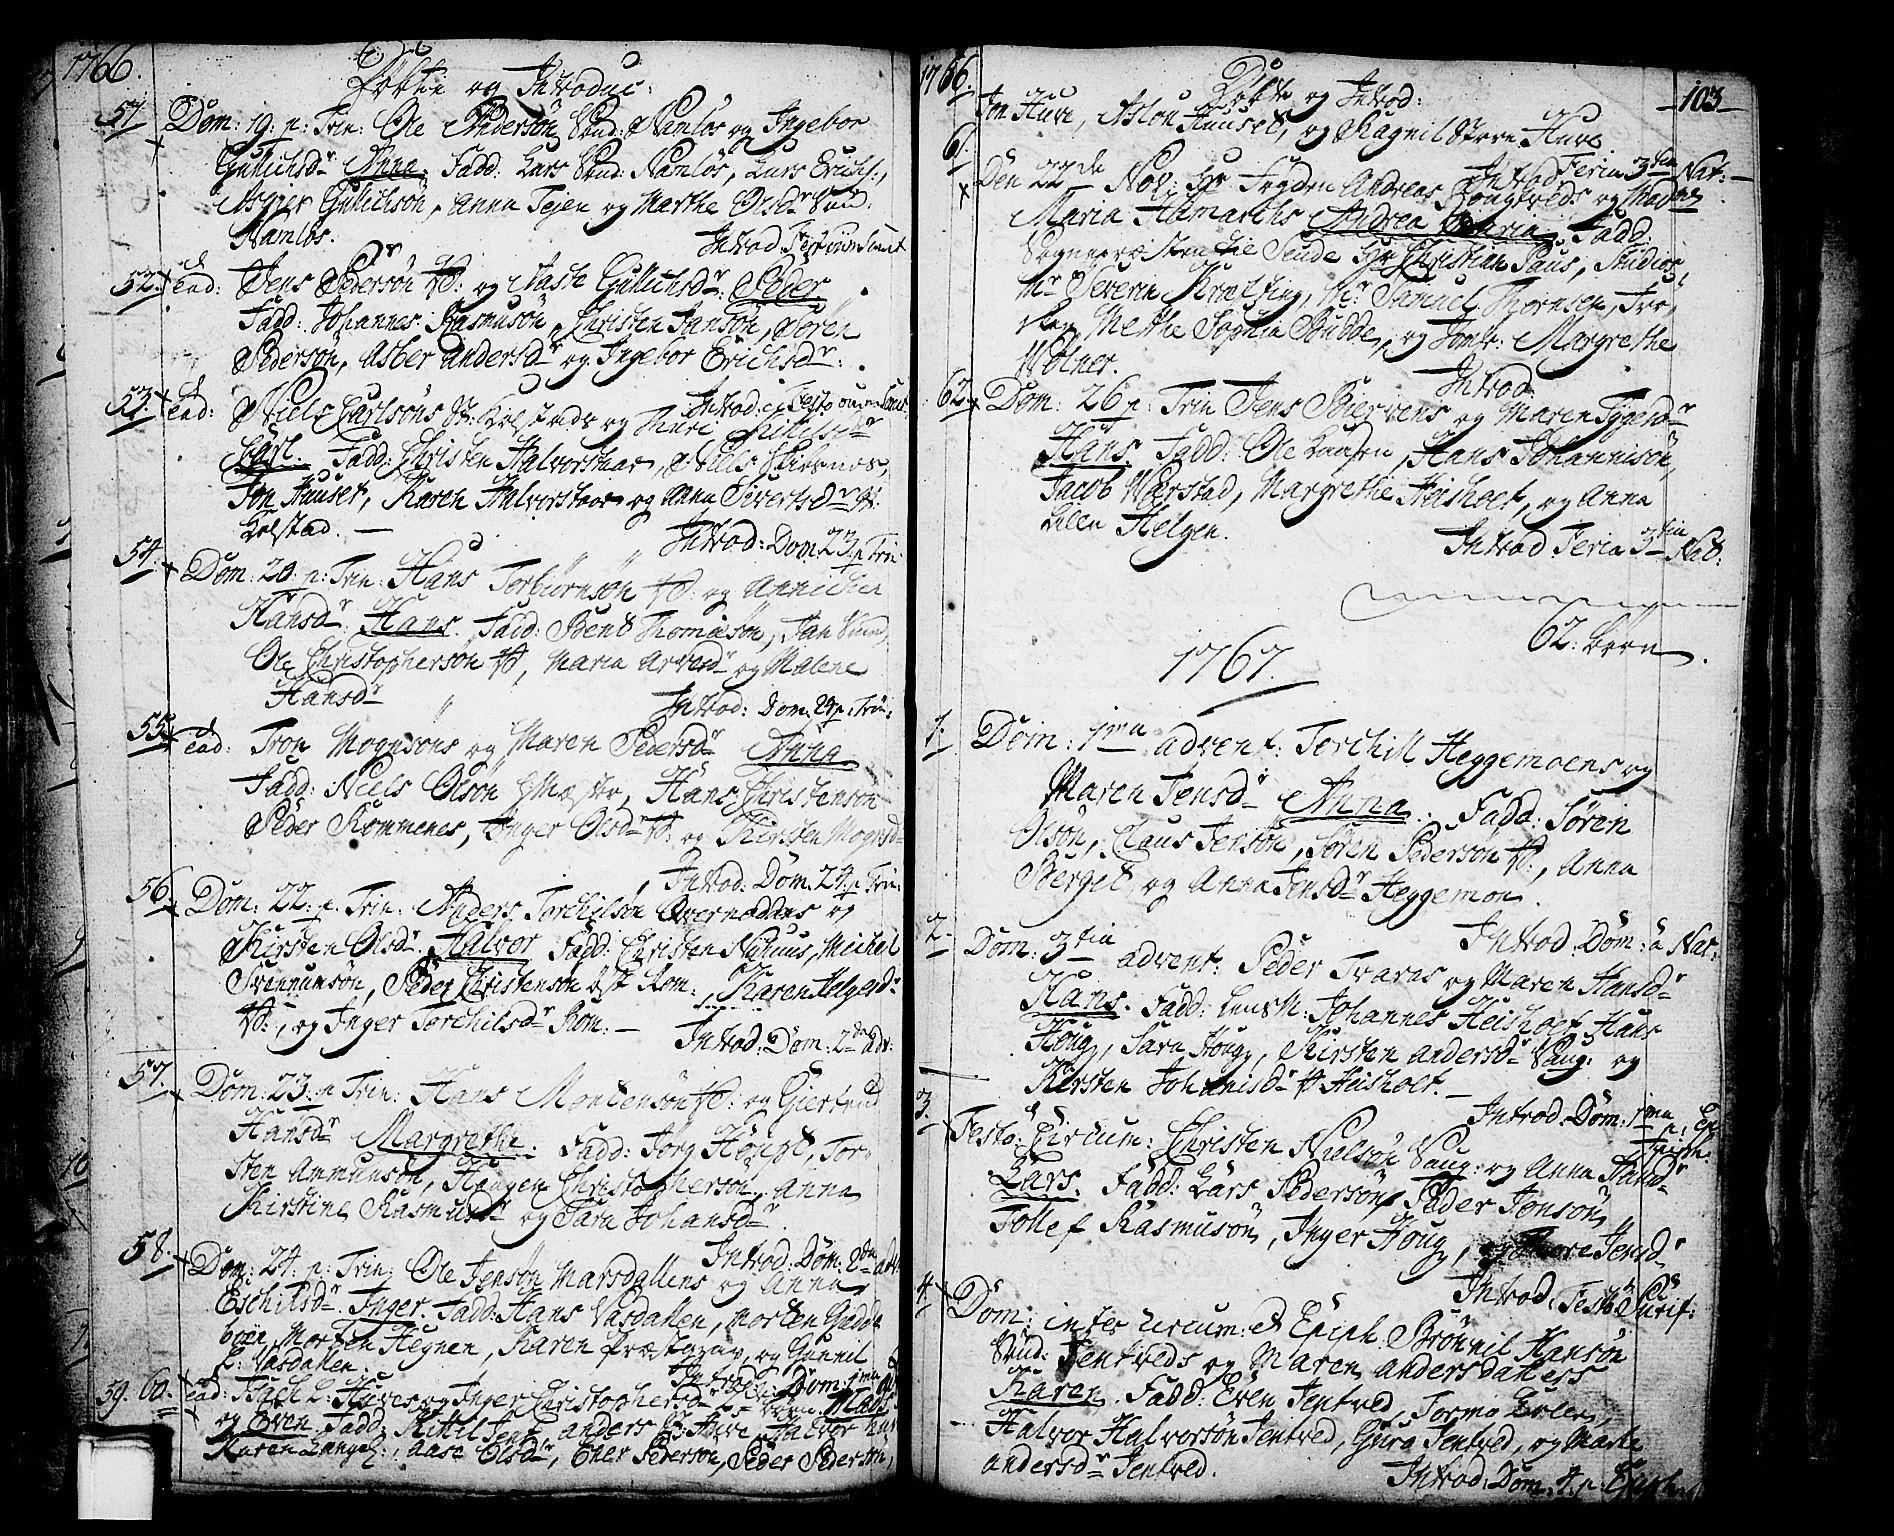 SAKO, Holla kirkebøker, F/Fa/L0001: Ministerialbok nr. 1, 1717-1779, s. 103